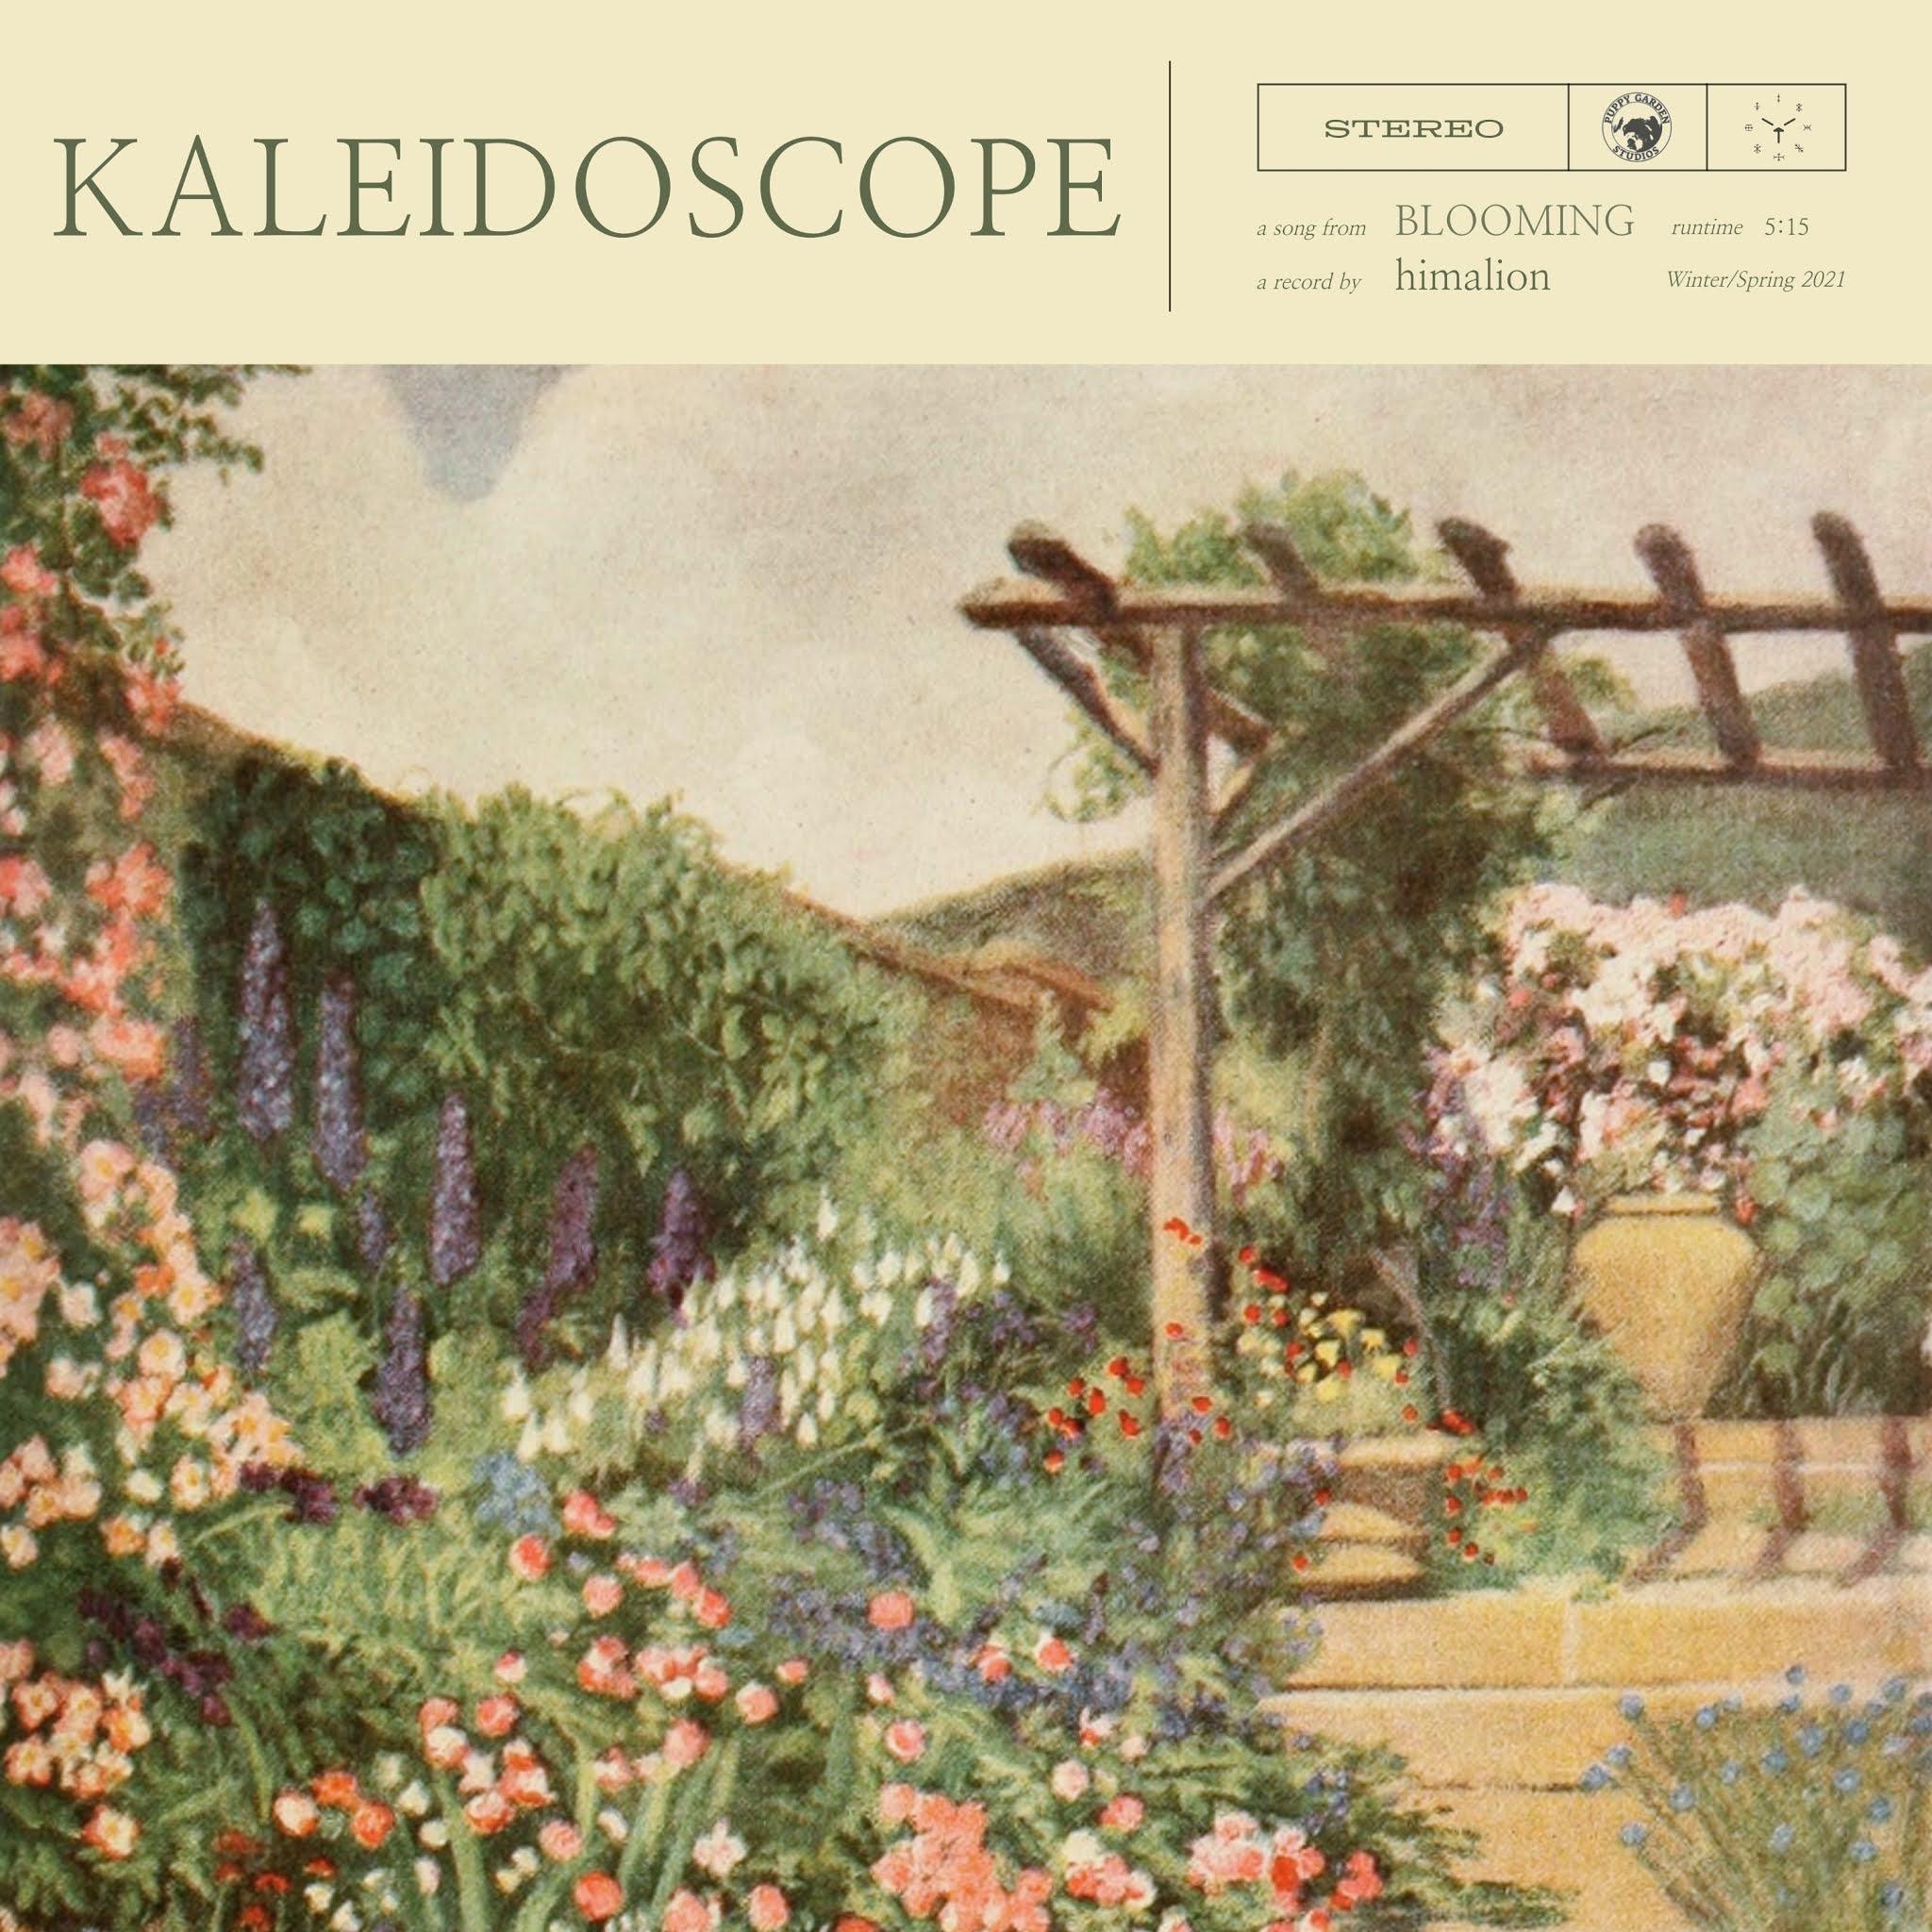 himalion-demonstra-cores-do-seu-kaleidoscope